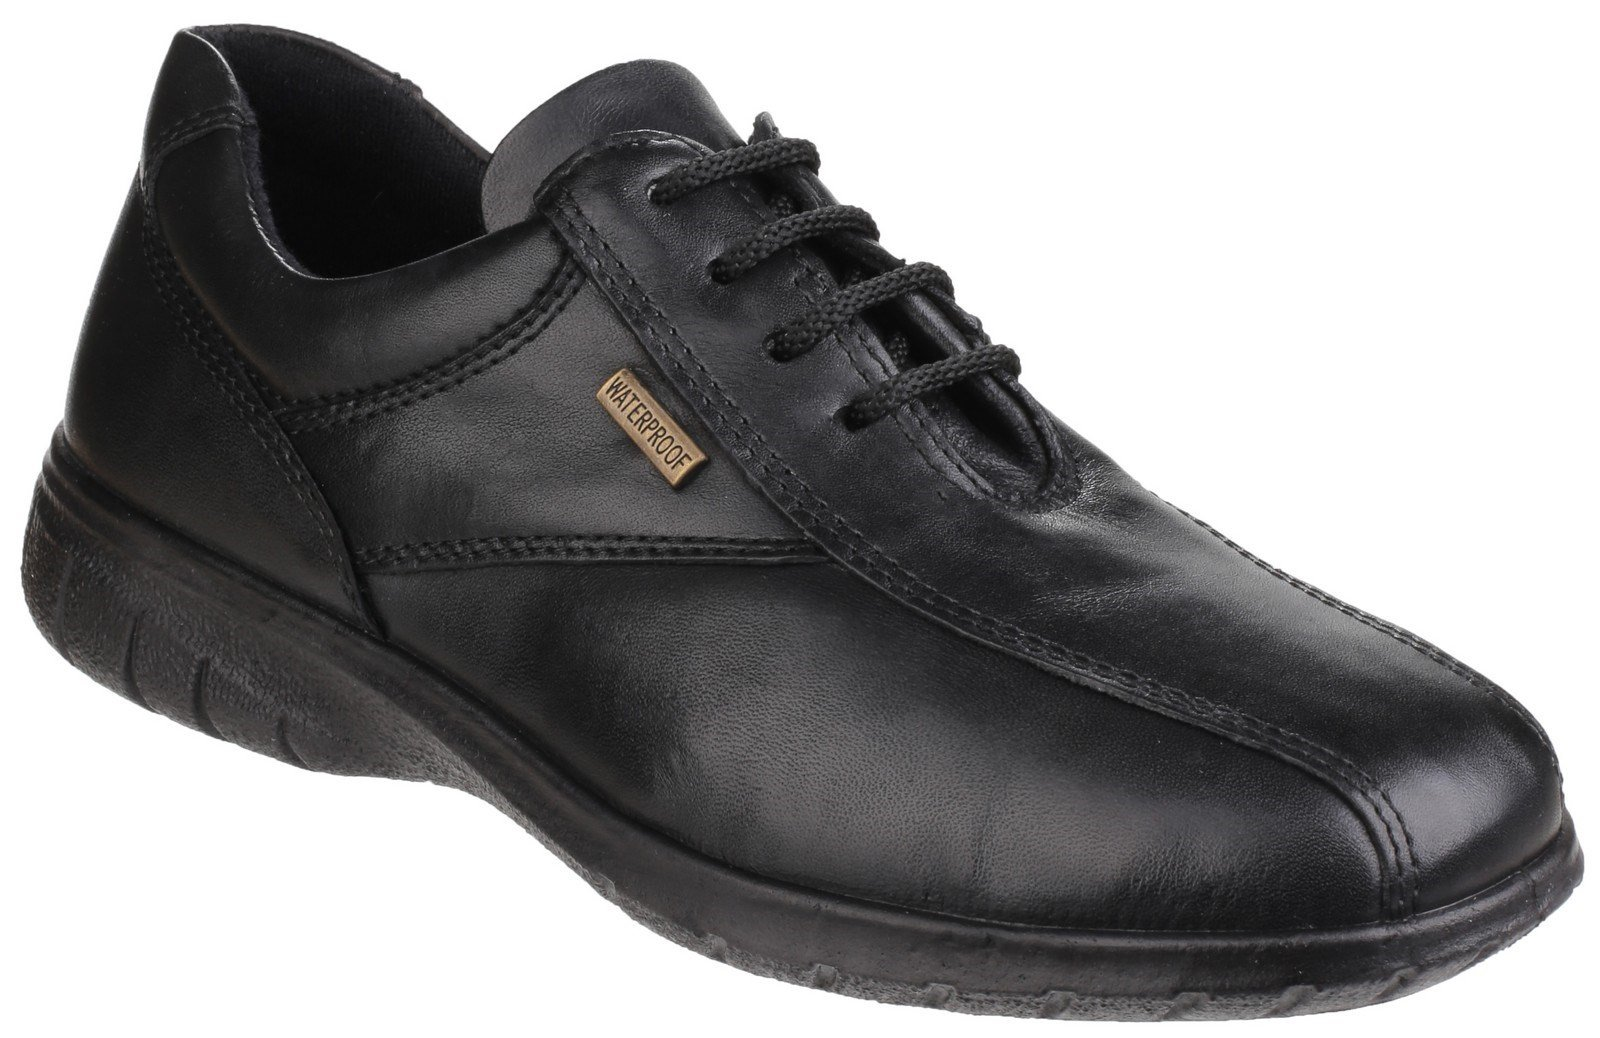 Cotswold Men's Collection Salford Shoe Various Colours 18154 - Black 3